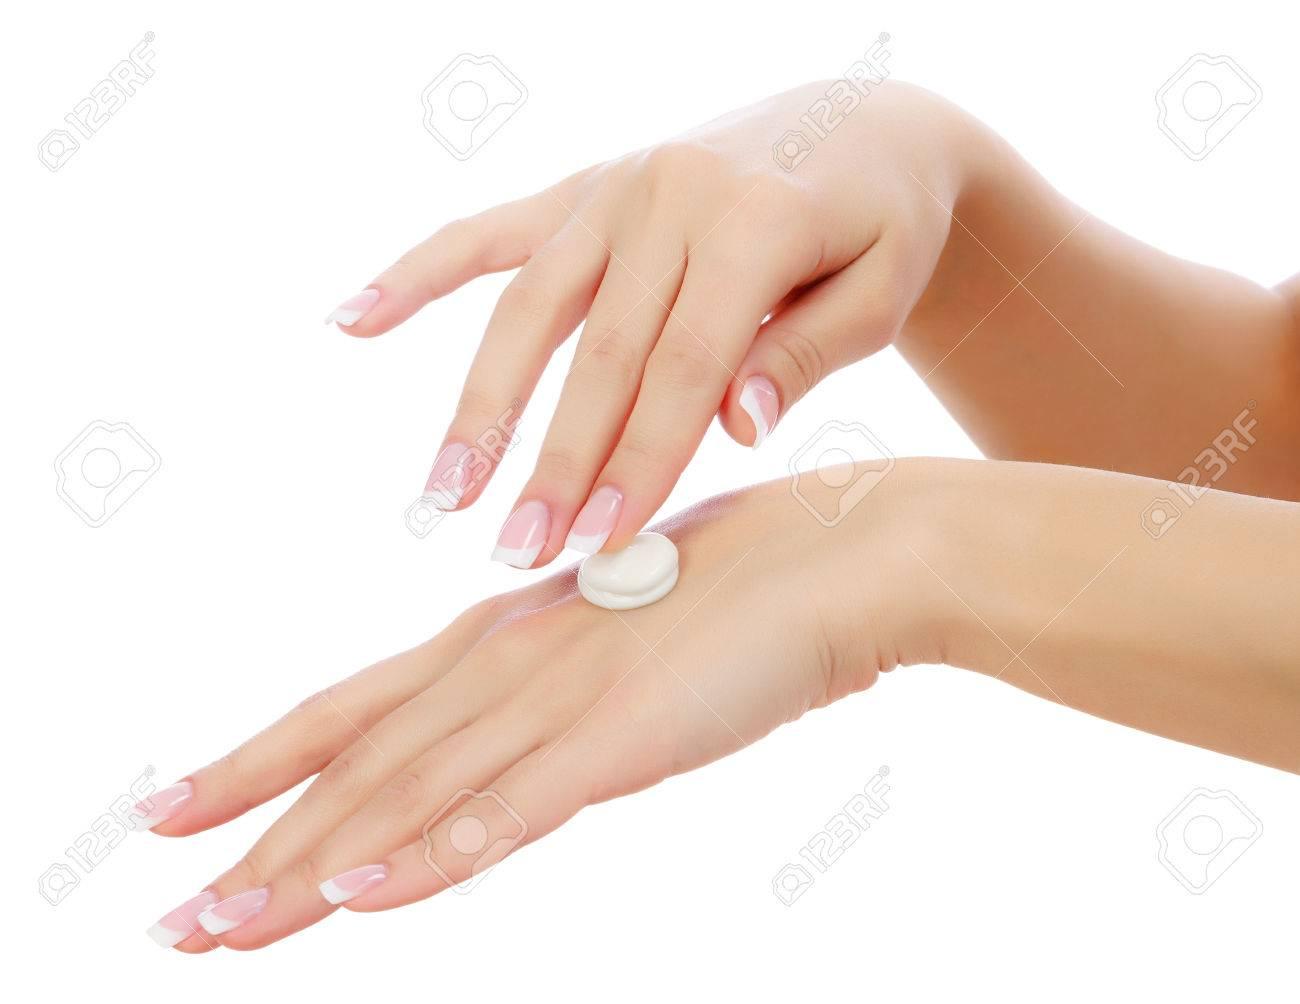 Female hands on white background Stock Photo - 24722565